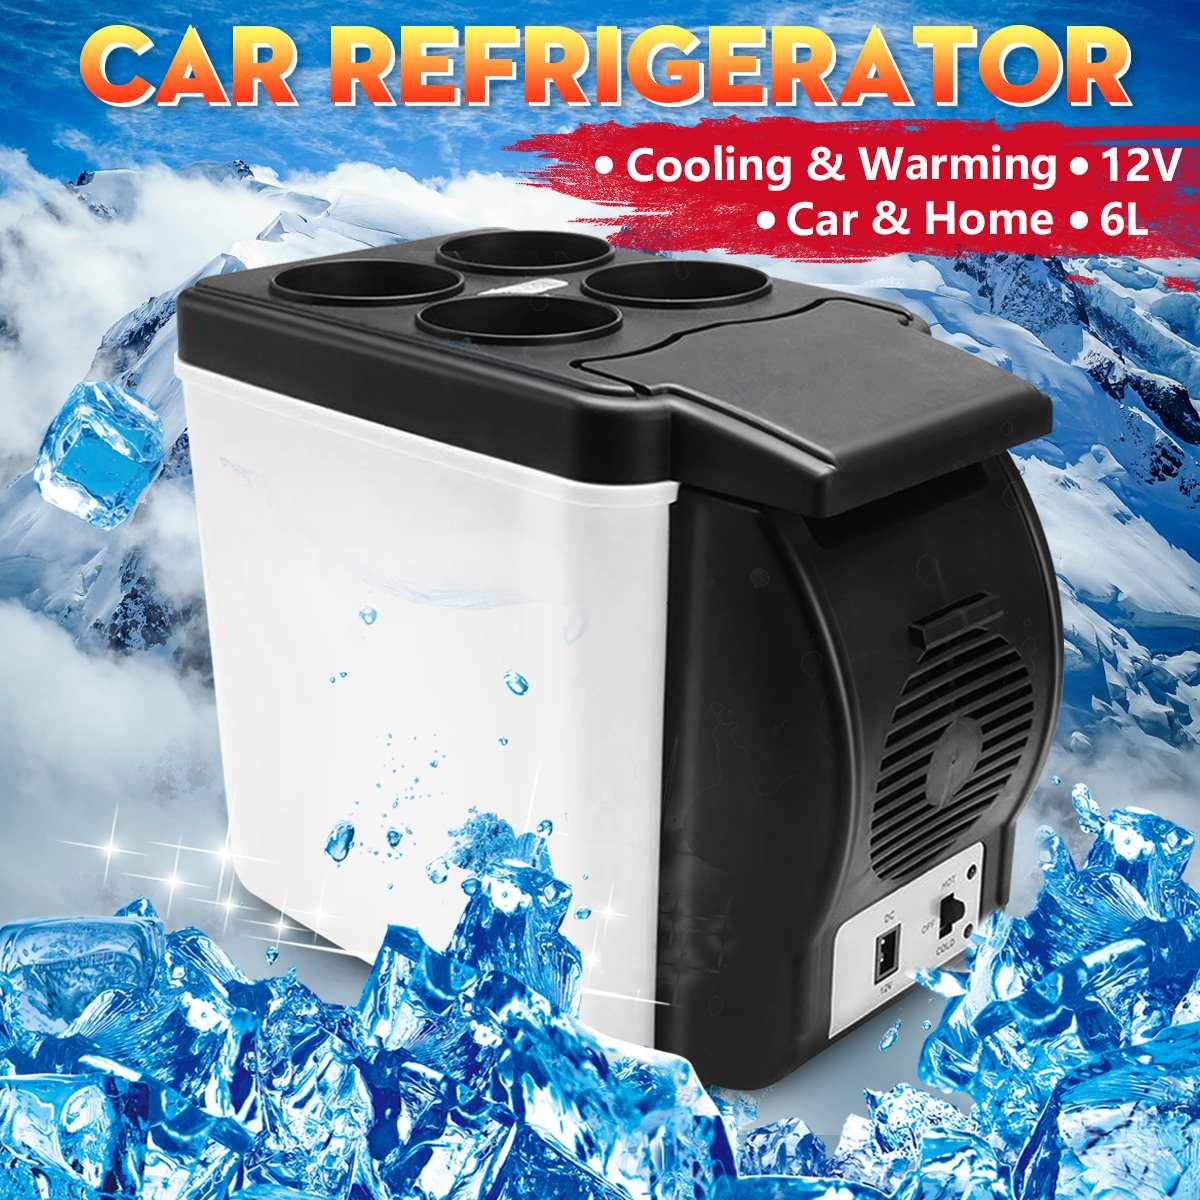 Mini nevera de Camping para casa 6L, nevera eléctrica, enfriador y calentador 12 V, caja portátil de viaje, congelador para Auto camión